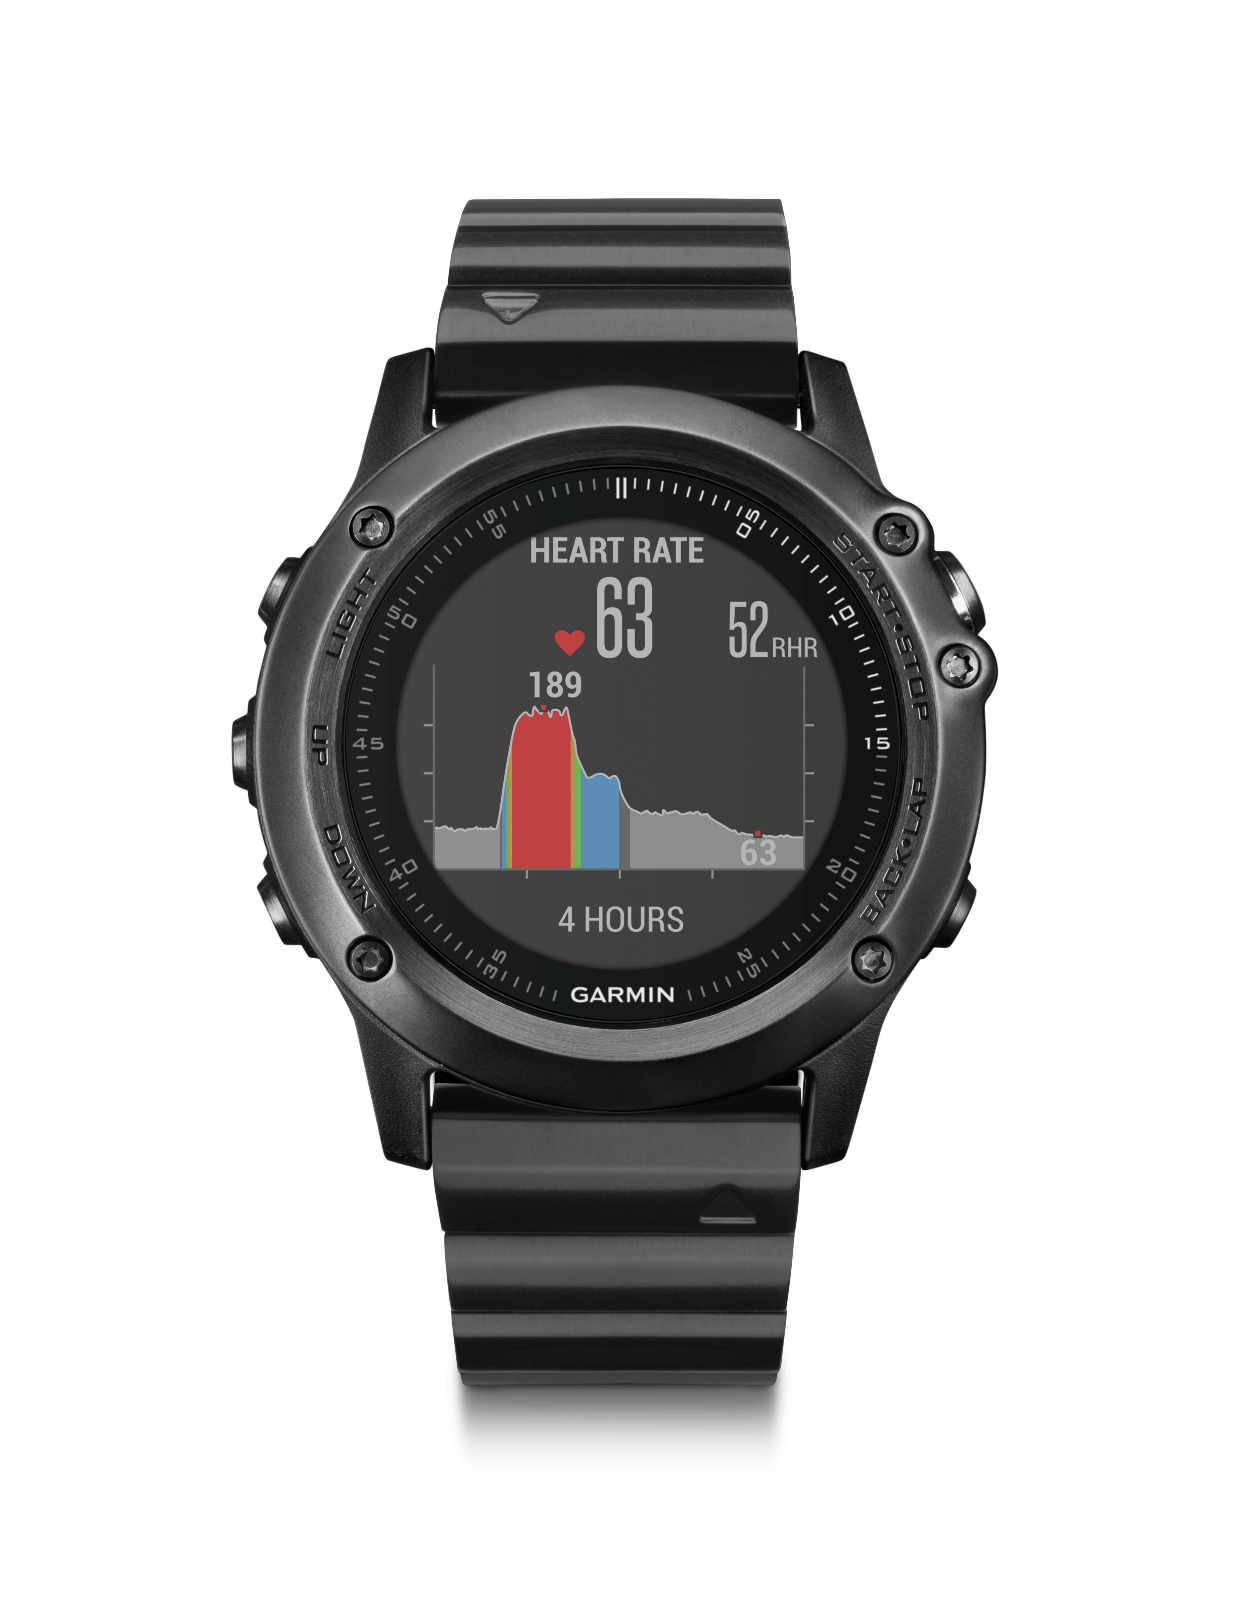 Garmin Fenix Fenix Garmin 3 HR Titanium GPS Watch | 010-01338-7B | AUTHORIZED GARMIN DEALER b30b6e